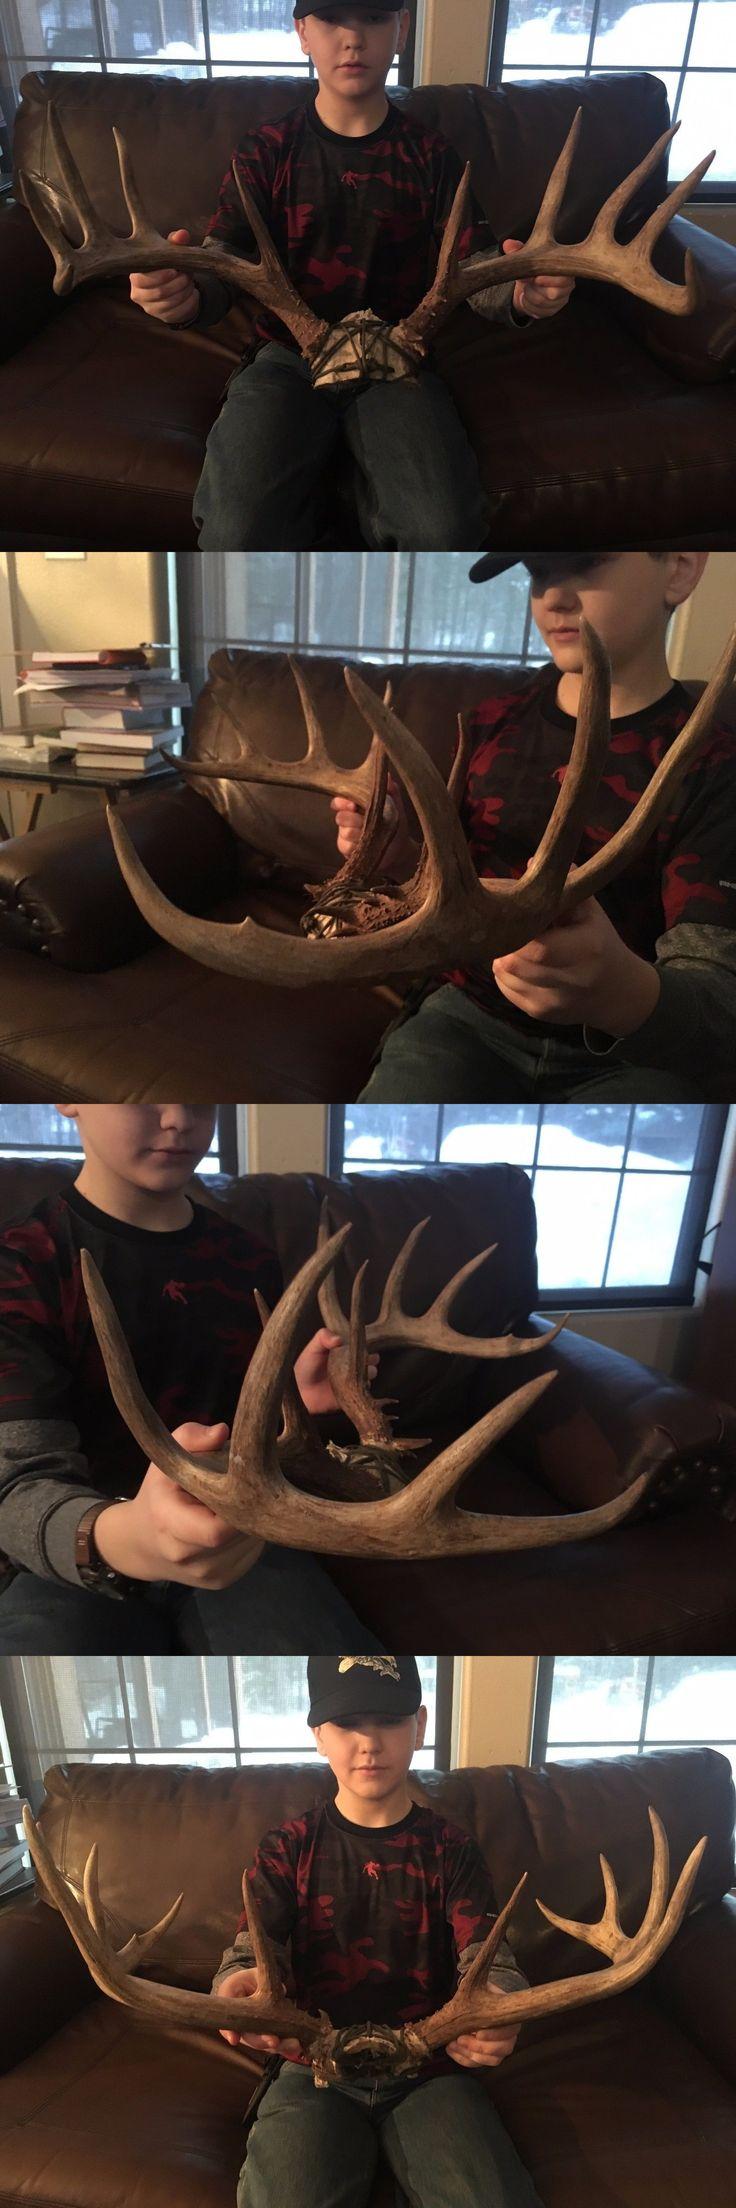 Other Taxidermy 22702: Nice 5X6 Whitetail Deer Antlers Horns Set Sheds Antler Muledeer Mule -> BUY IT NOW ONLY: $110.95 on eBay!